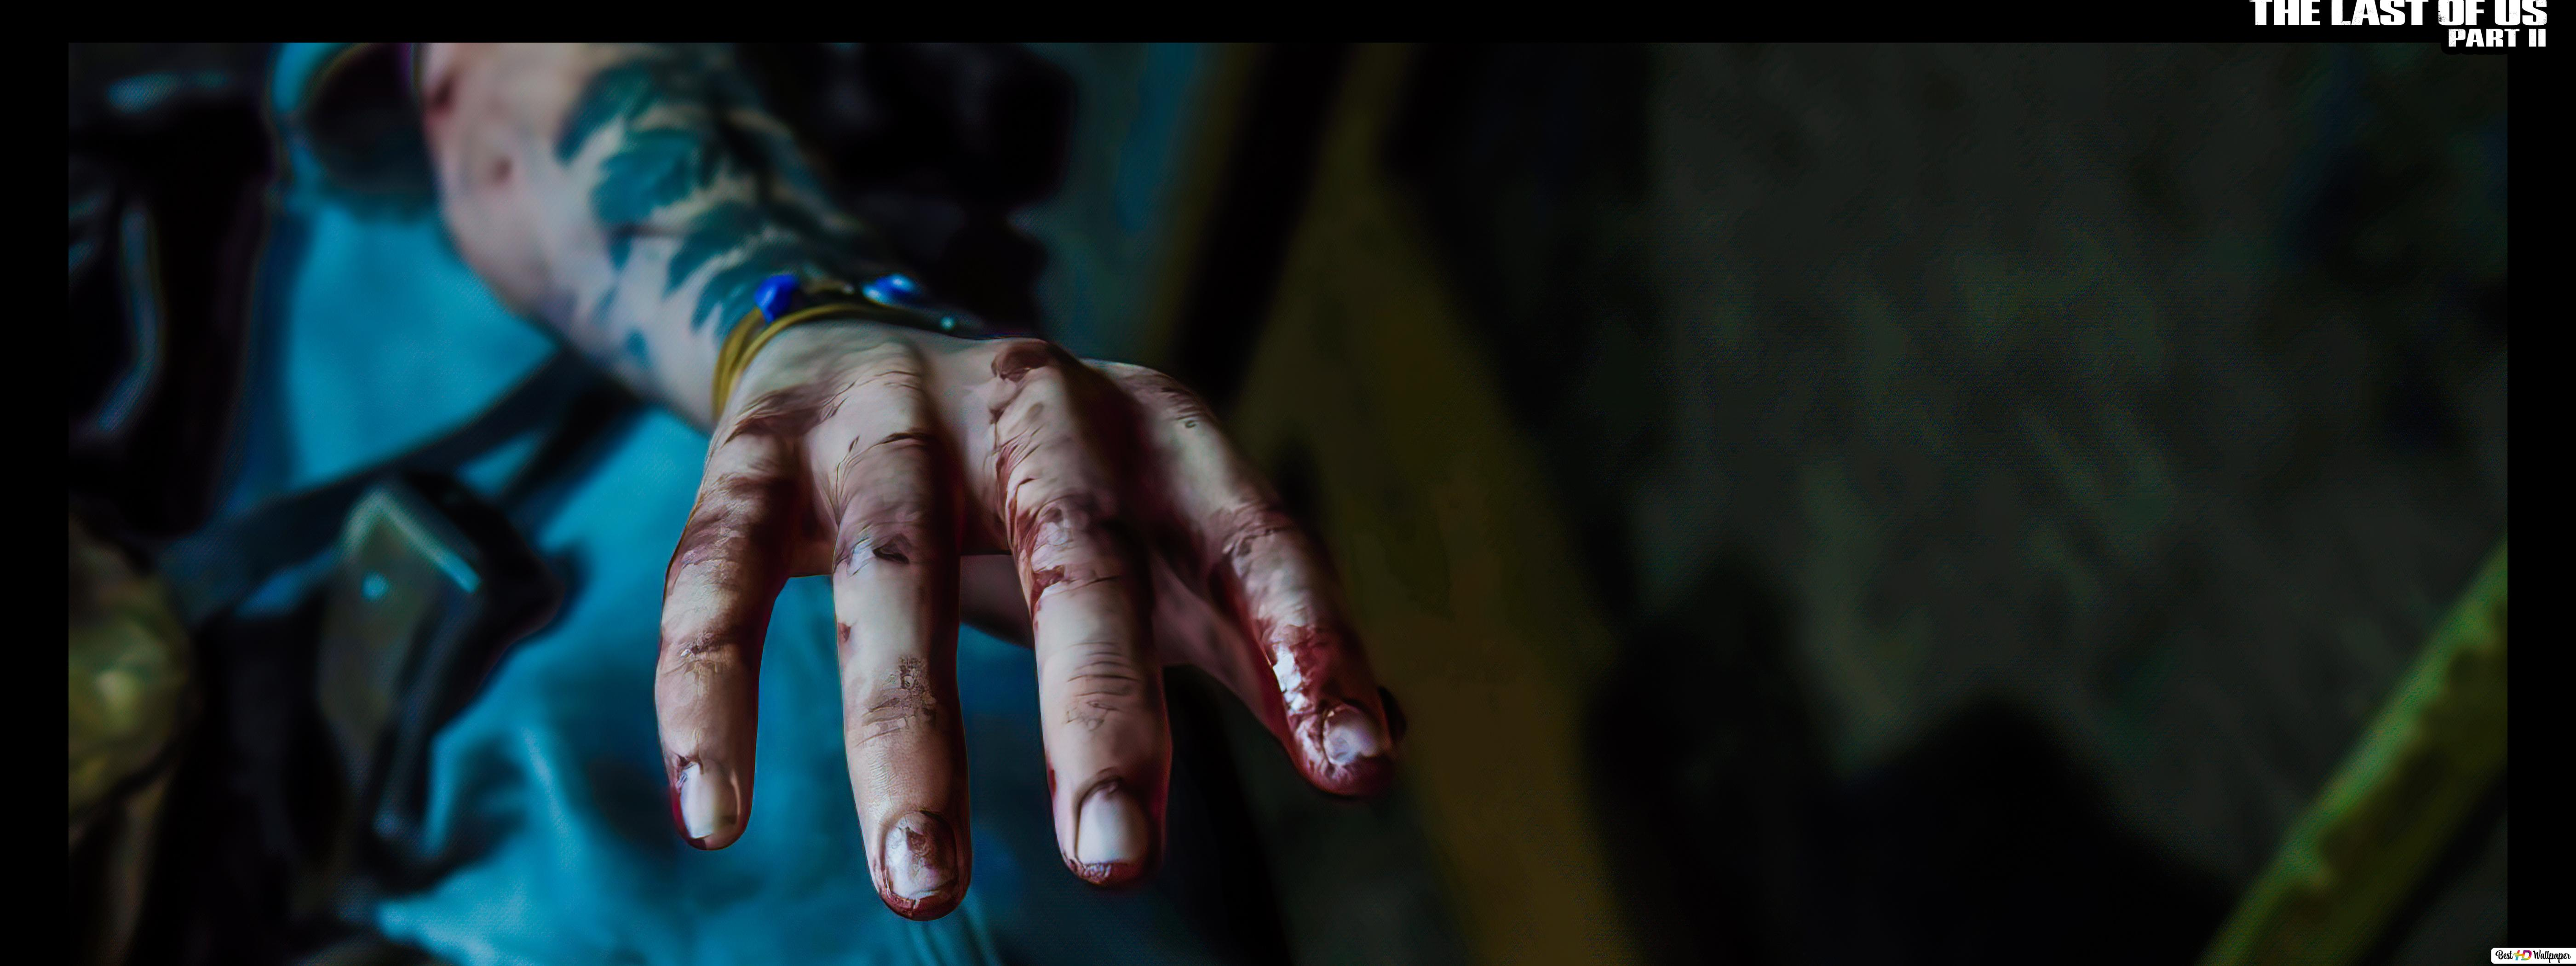 The Last Of Us 2 Ellie Blood Hand 8k 4k Hd Wallpaper Download